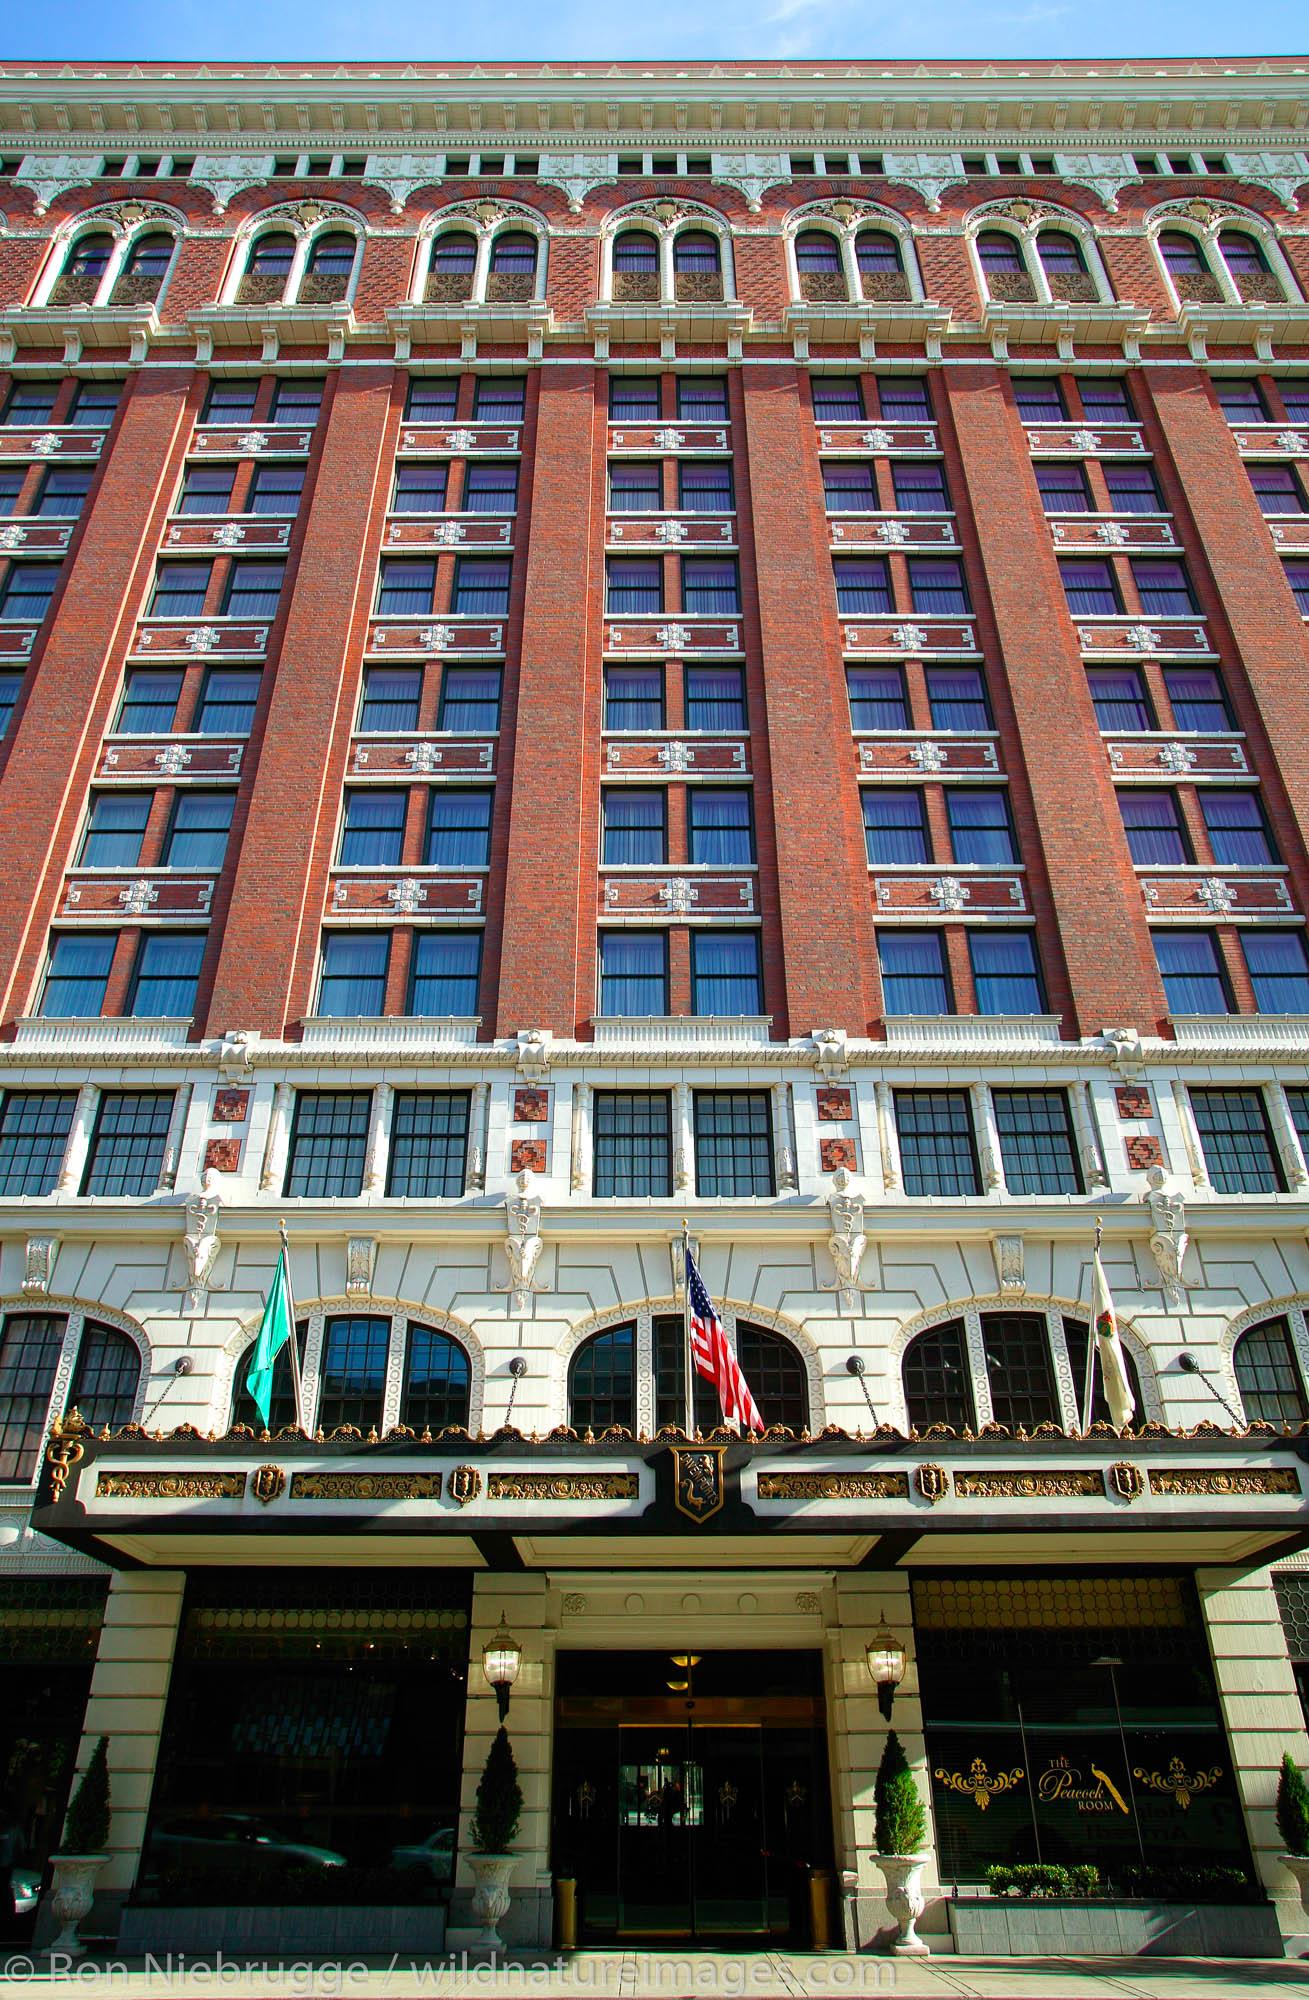 The historic Davenport Hotel in downtown Spokane, Washington.